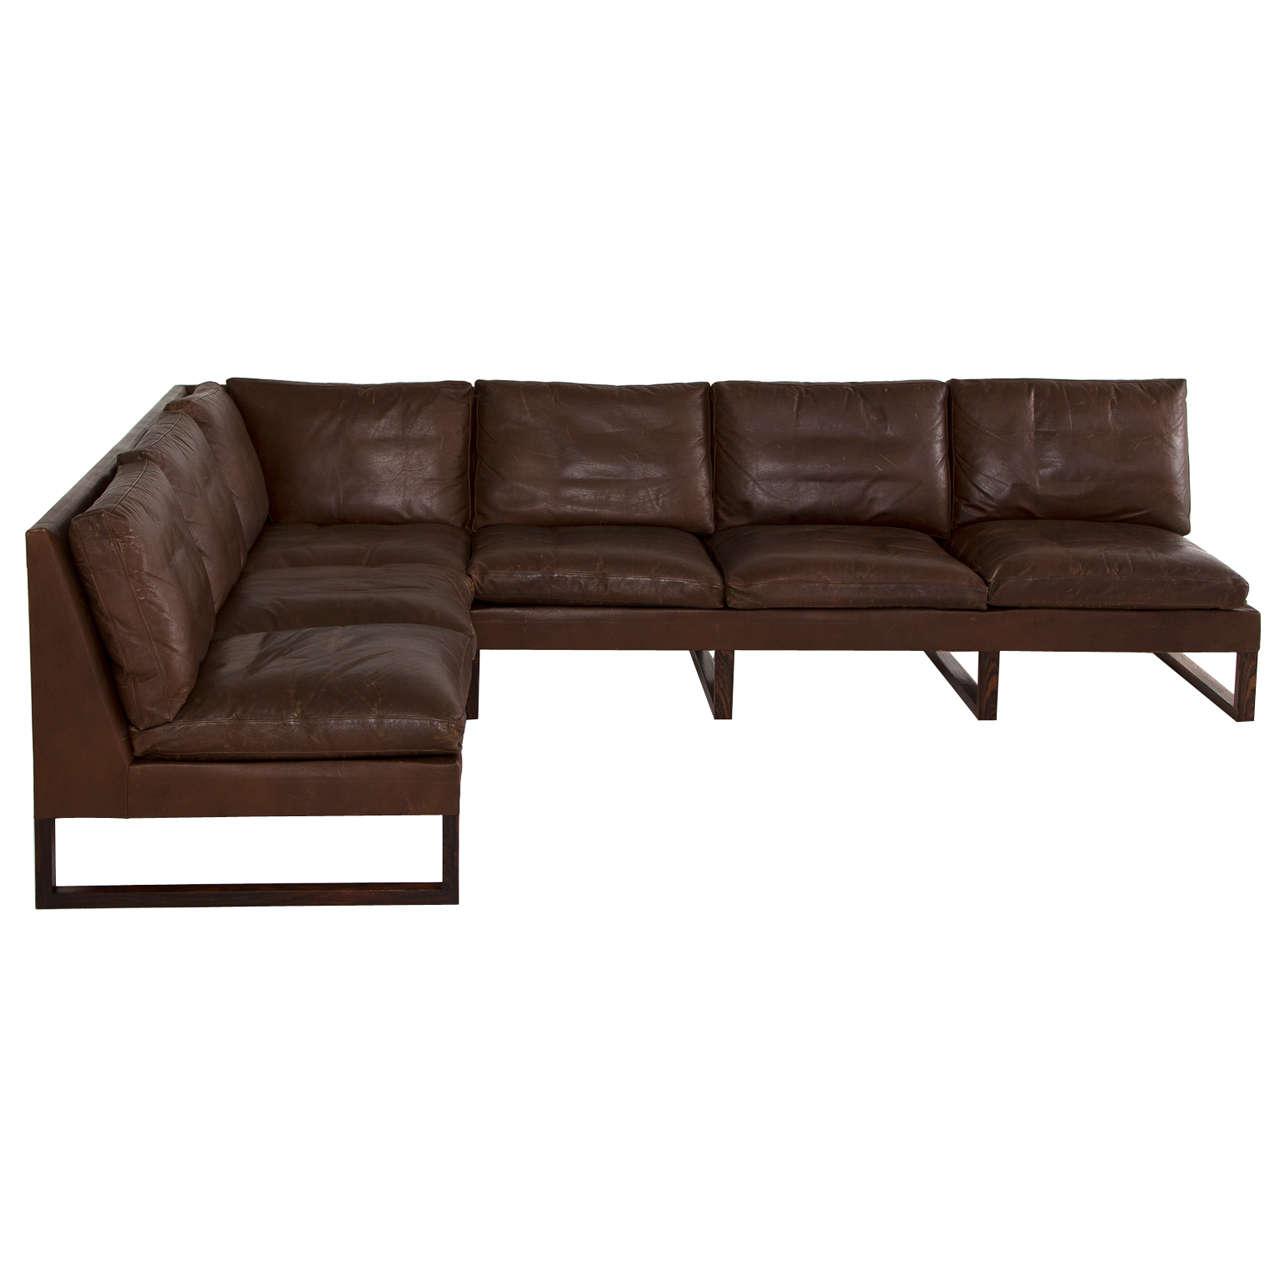 Danish Mid Century Cornersofa In Dark Brown Leather For Sale